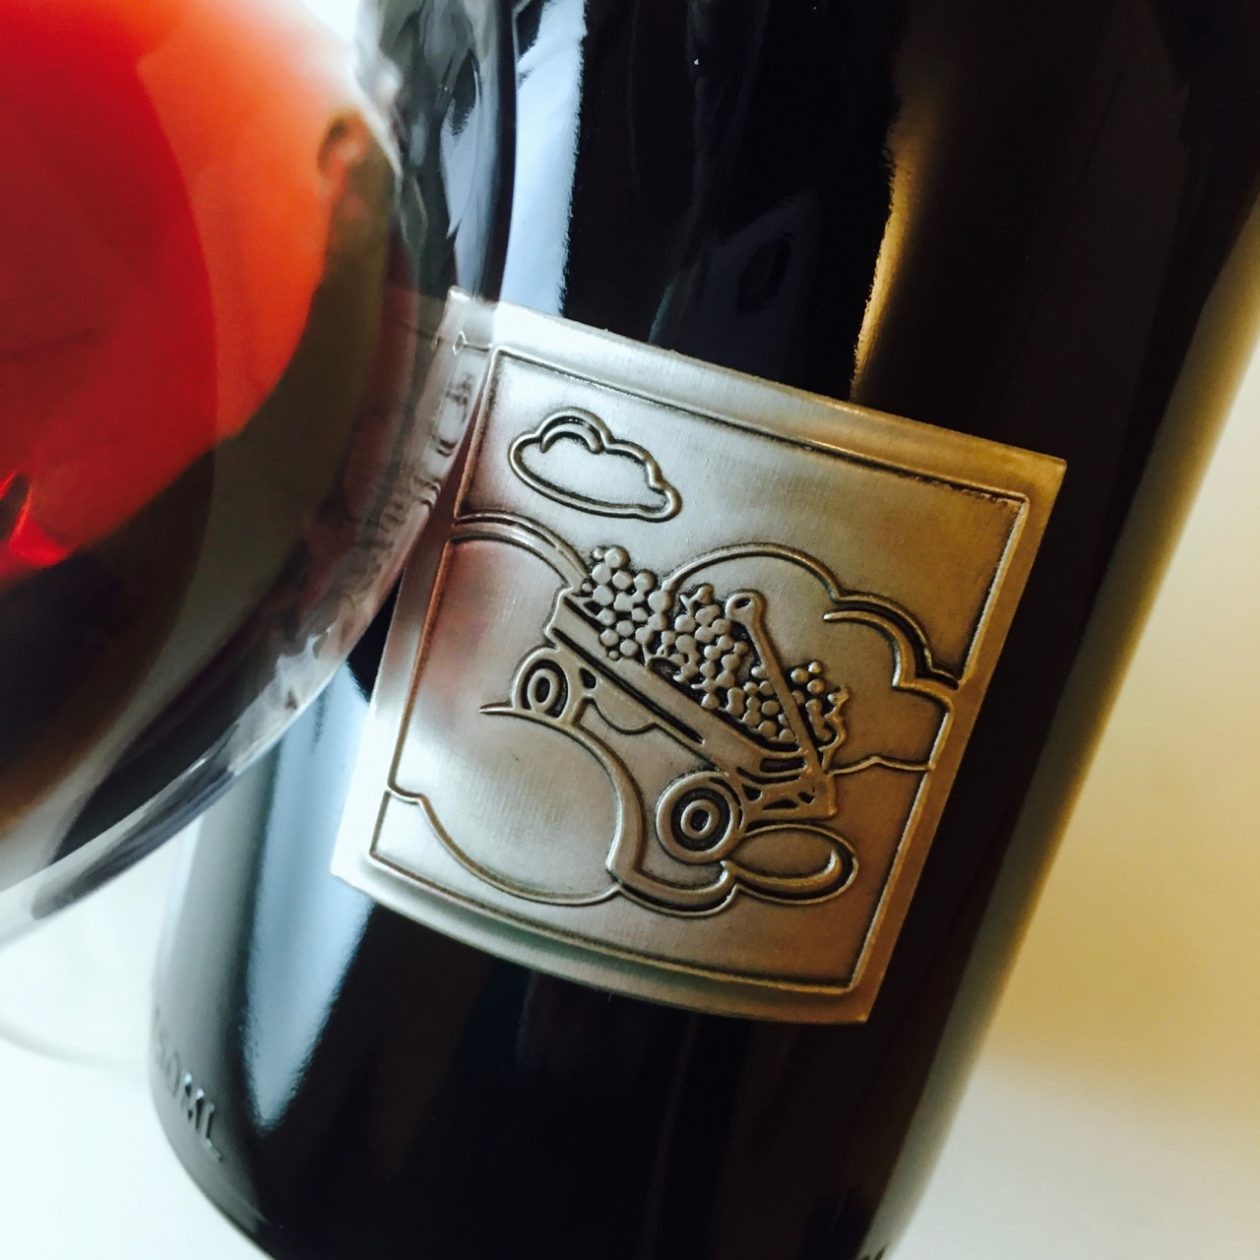 2014 Macphail Family Wines Pinot Noir Mardikian Estate Sonoma Coast, Sonoma County